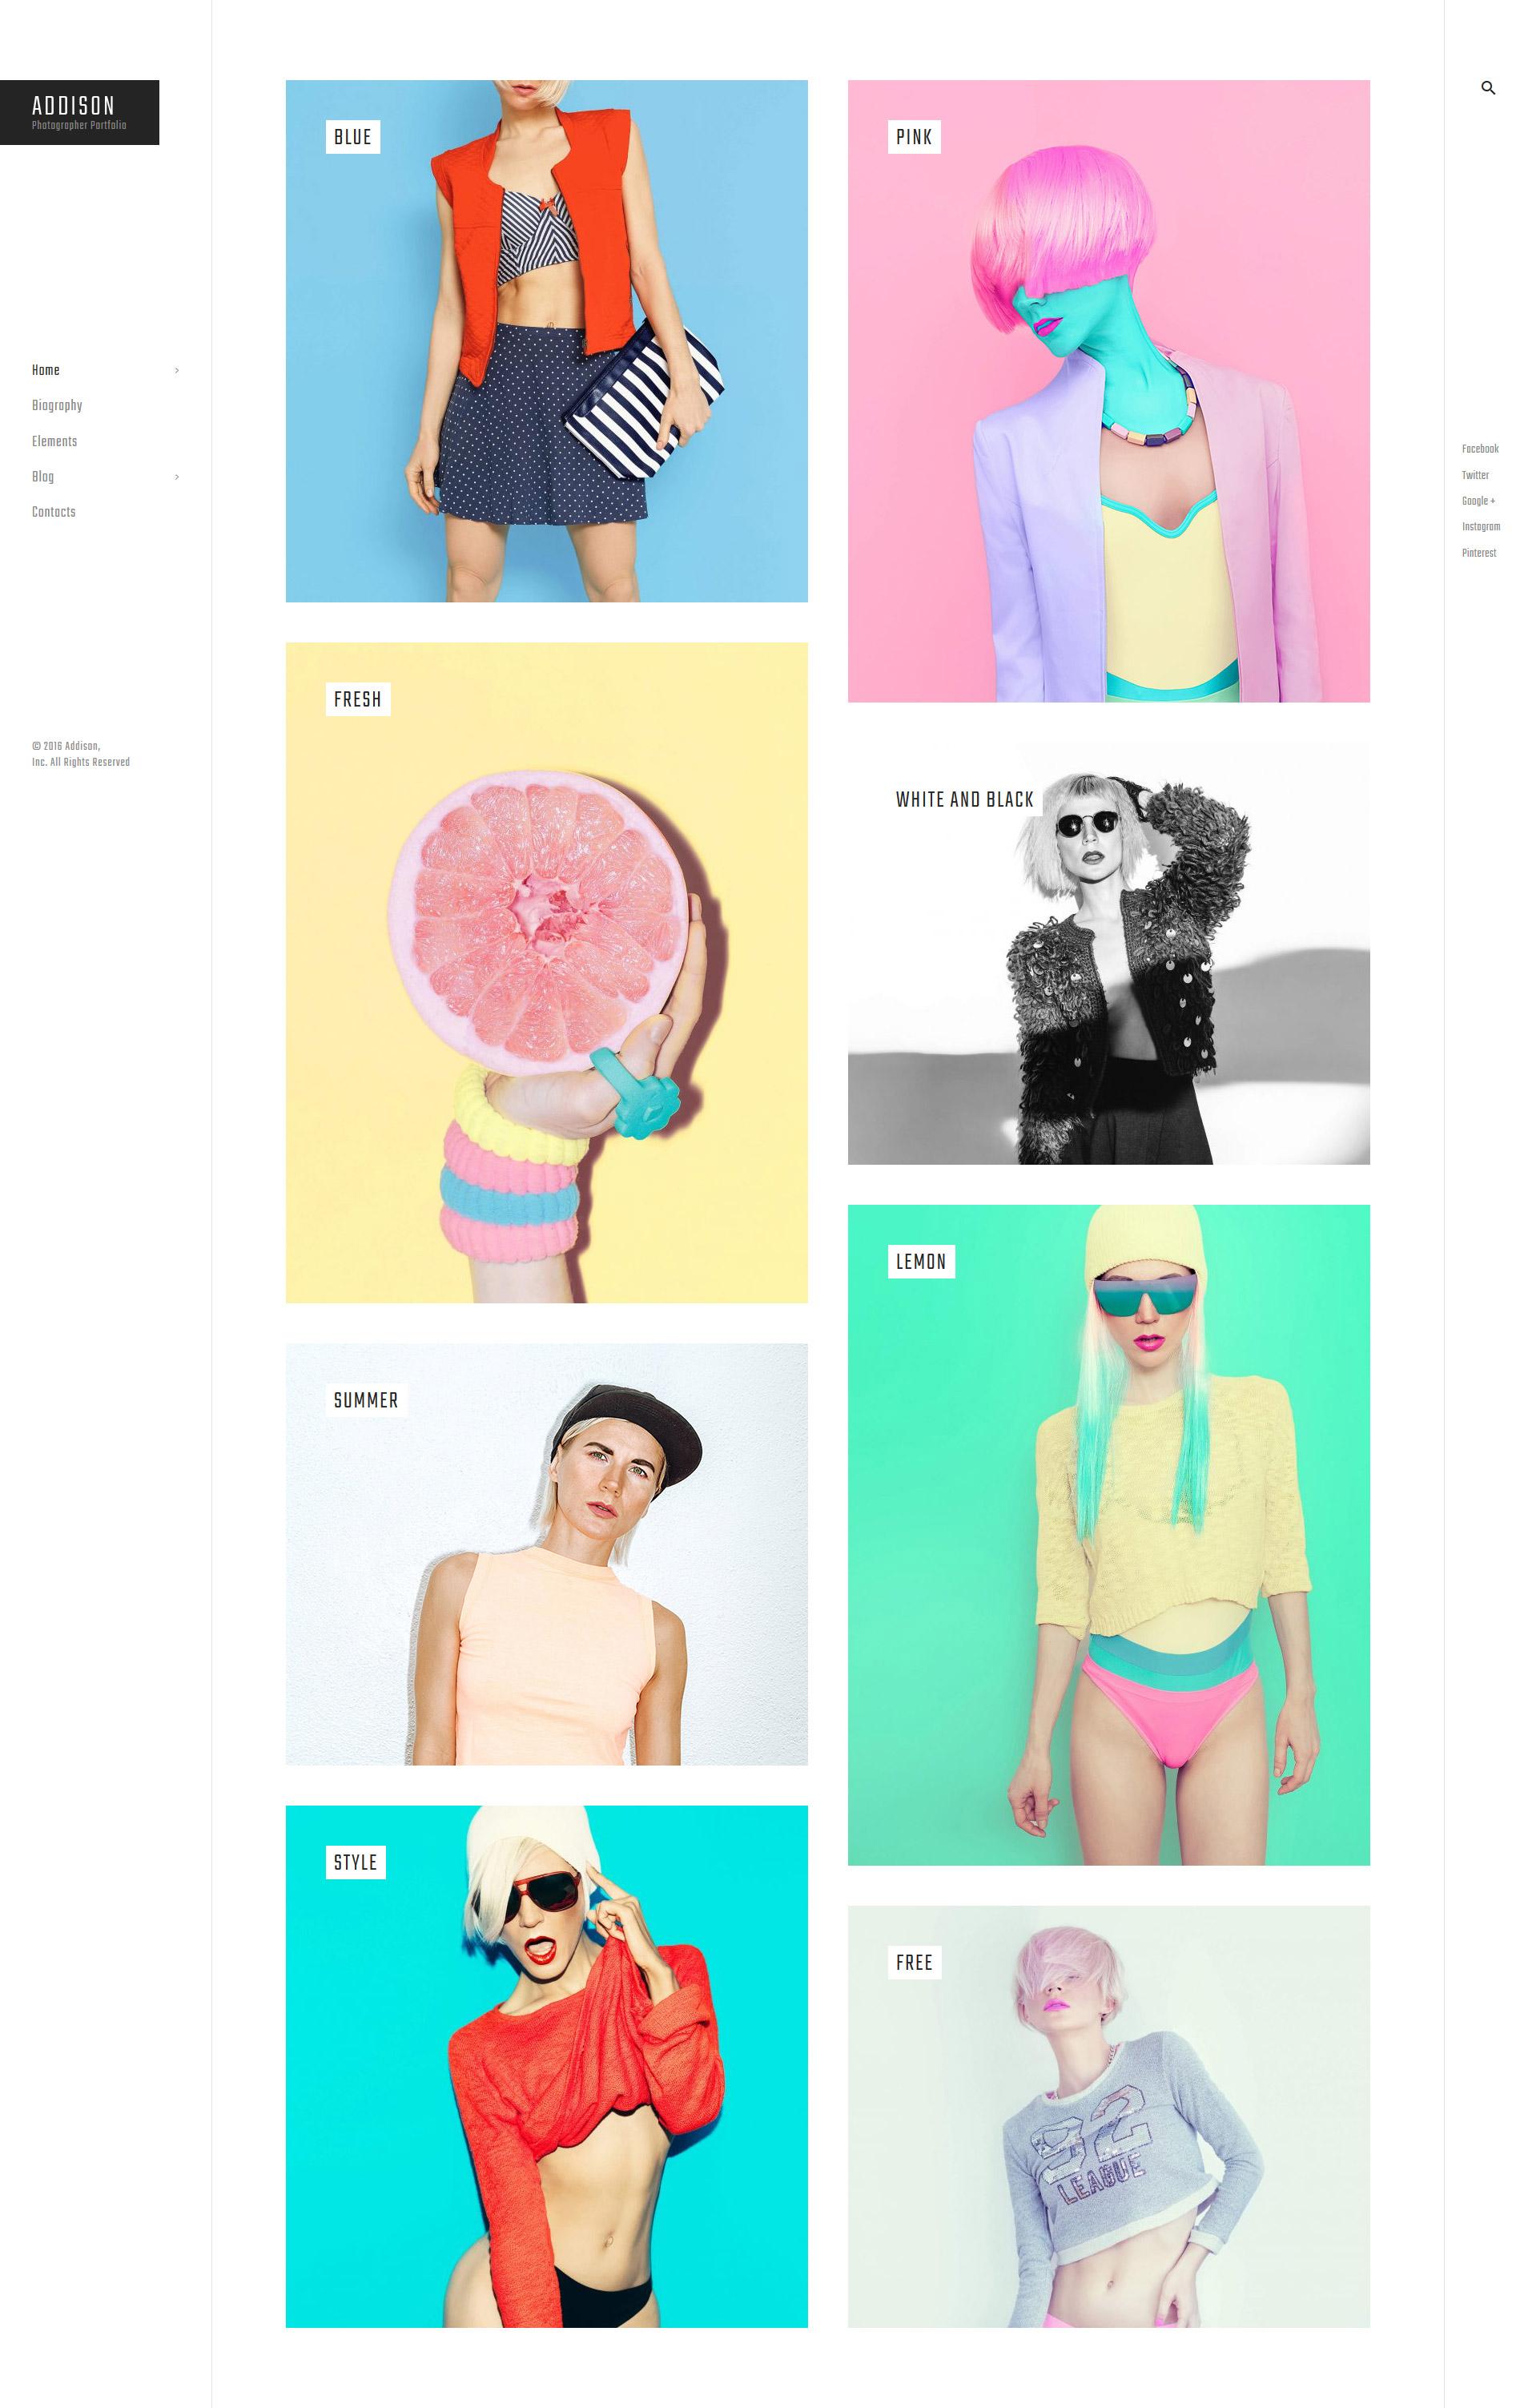 """Addison - Creative Photographer Portfolio"" 响应式WordPress模板 #58912 - 截图"